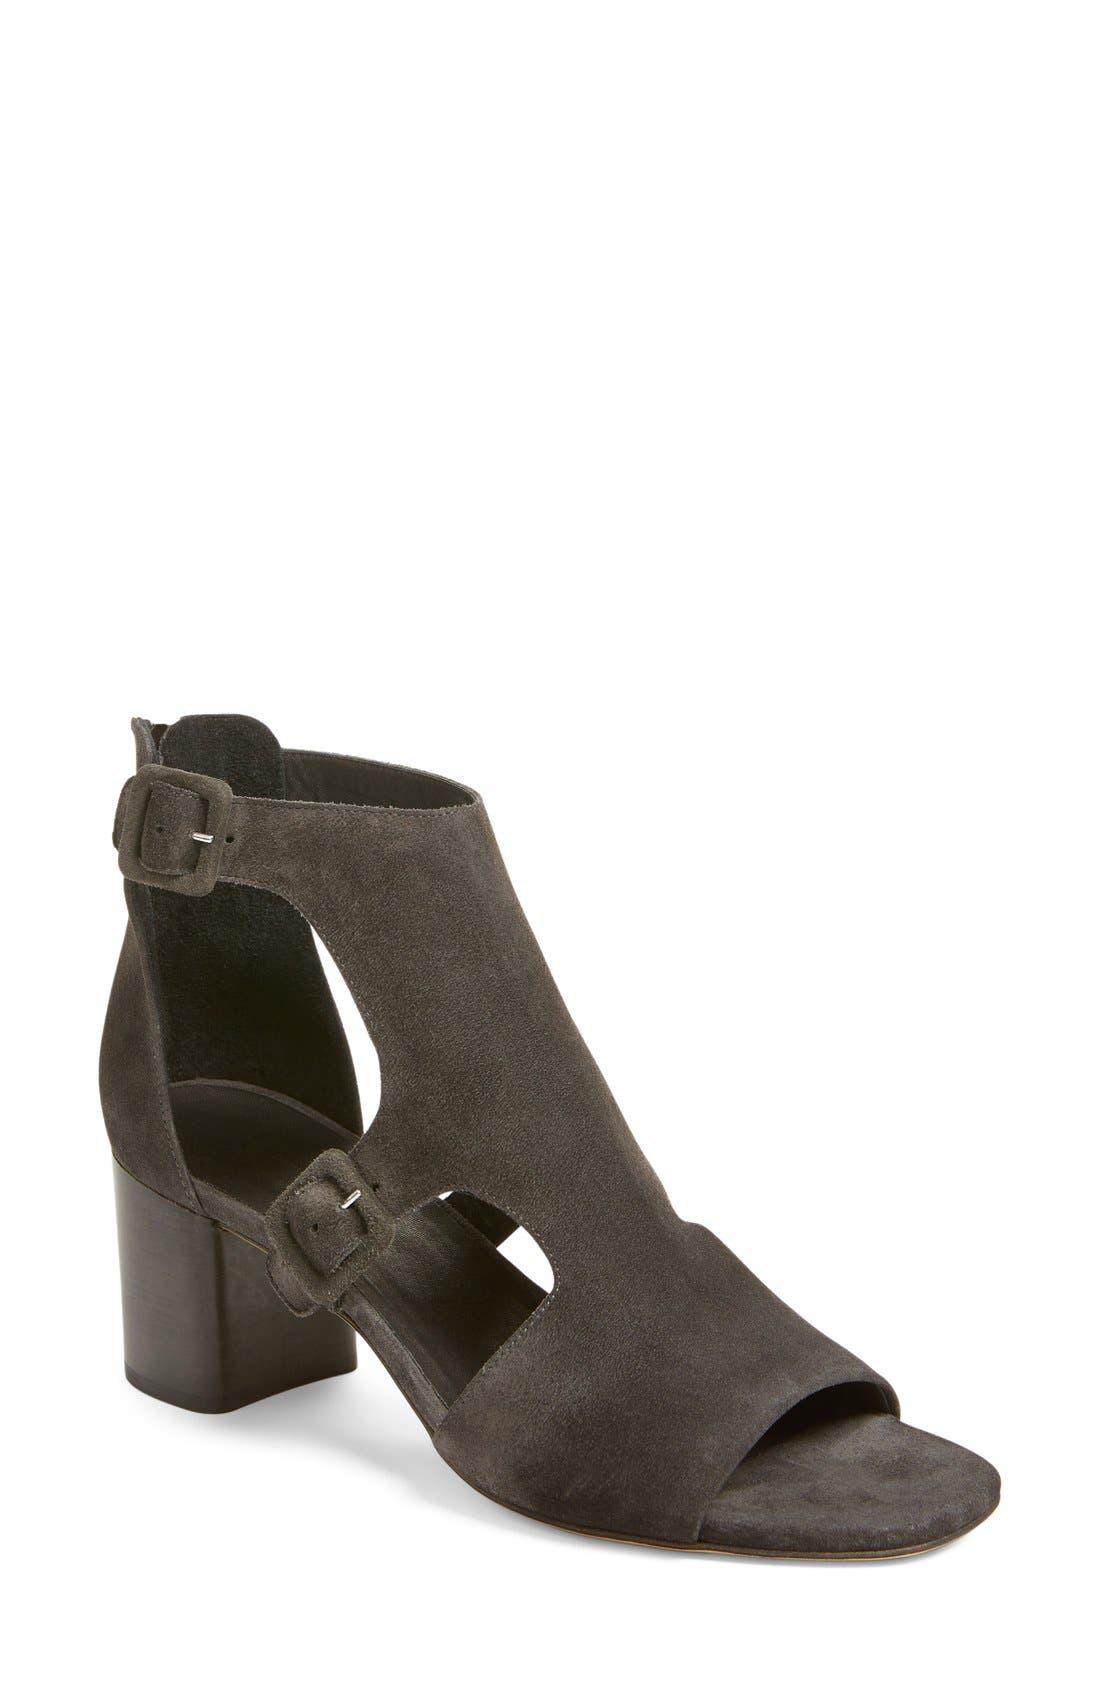 Matteo Block Heel Sandal,                             Main thumbnail 1, color,                             021